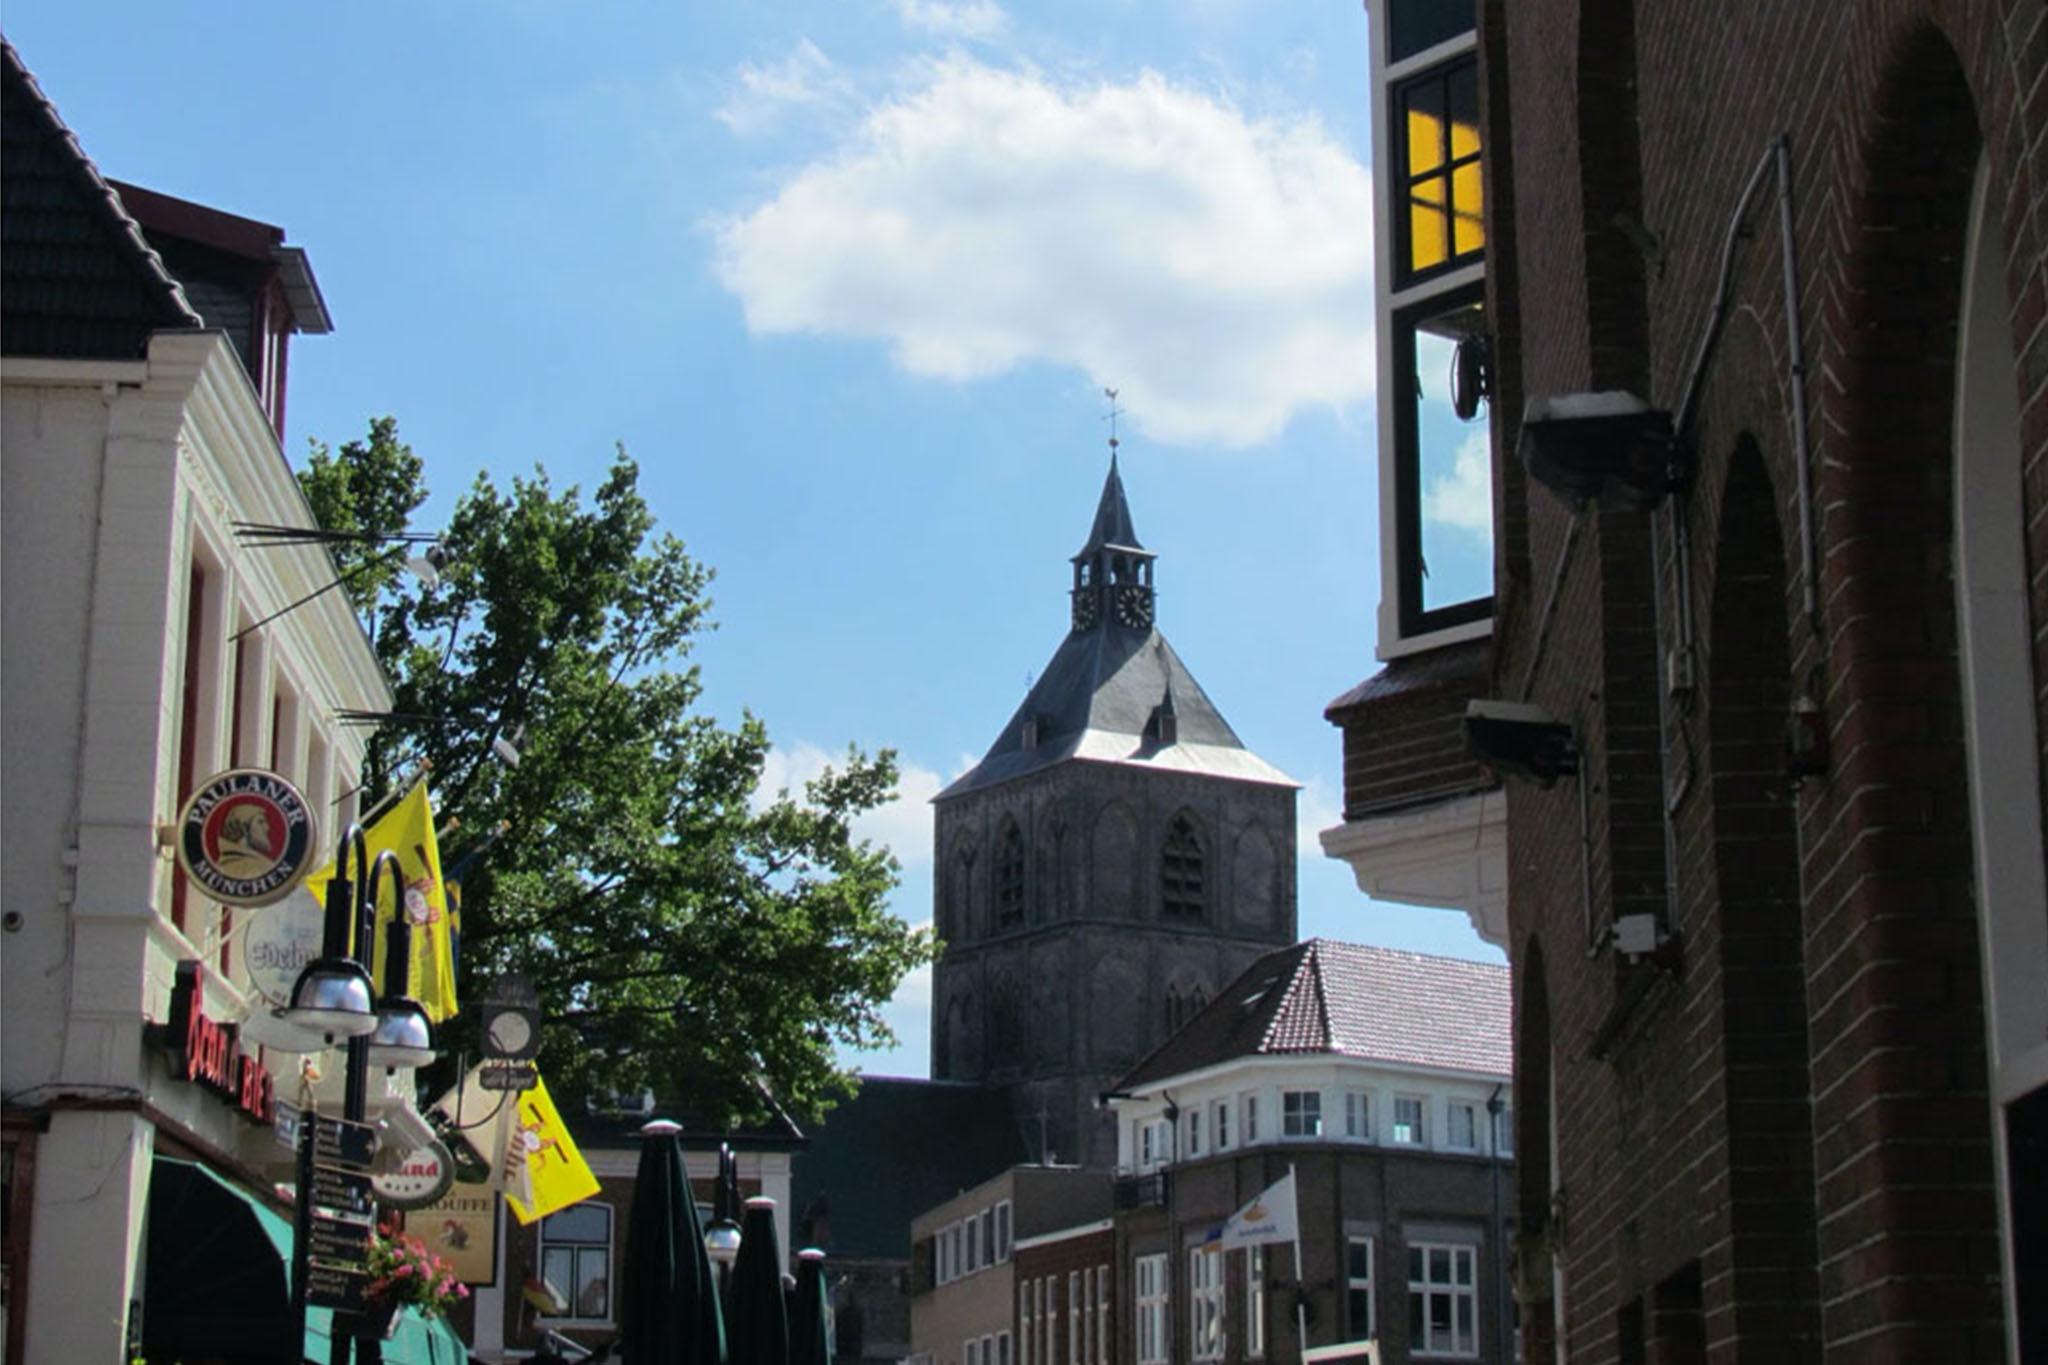 Gemeente Oldenzaal (placemaking - placebranding)